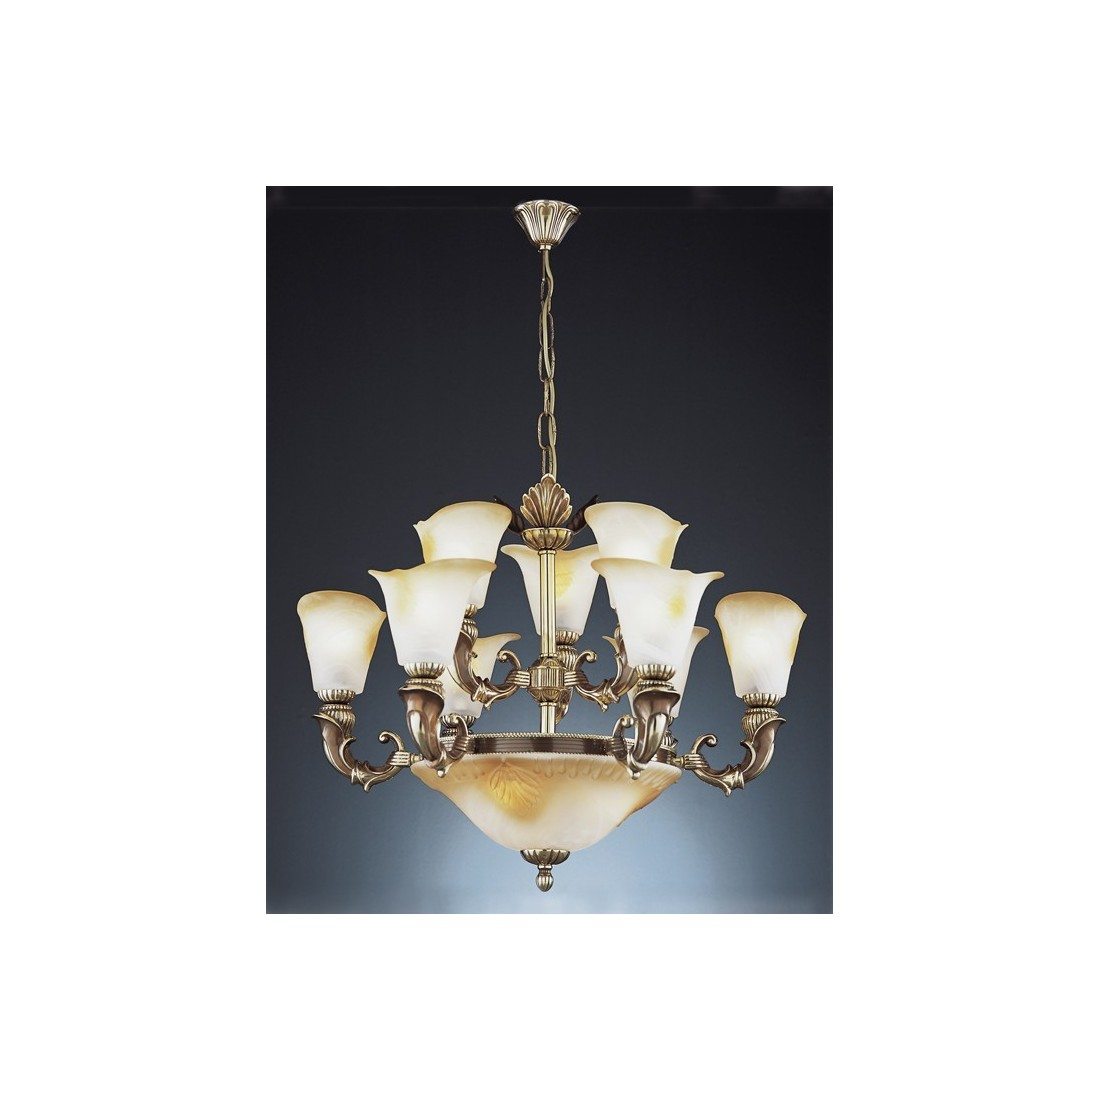 Semiplafón de bronce con tulipas de cristal de murano. Envío rápido